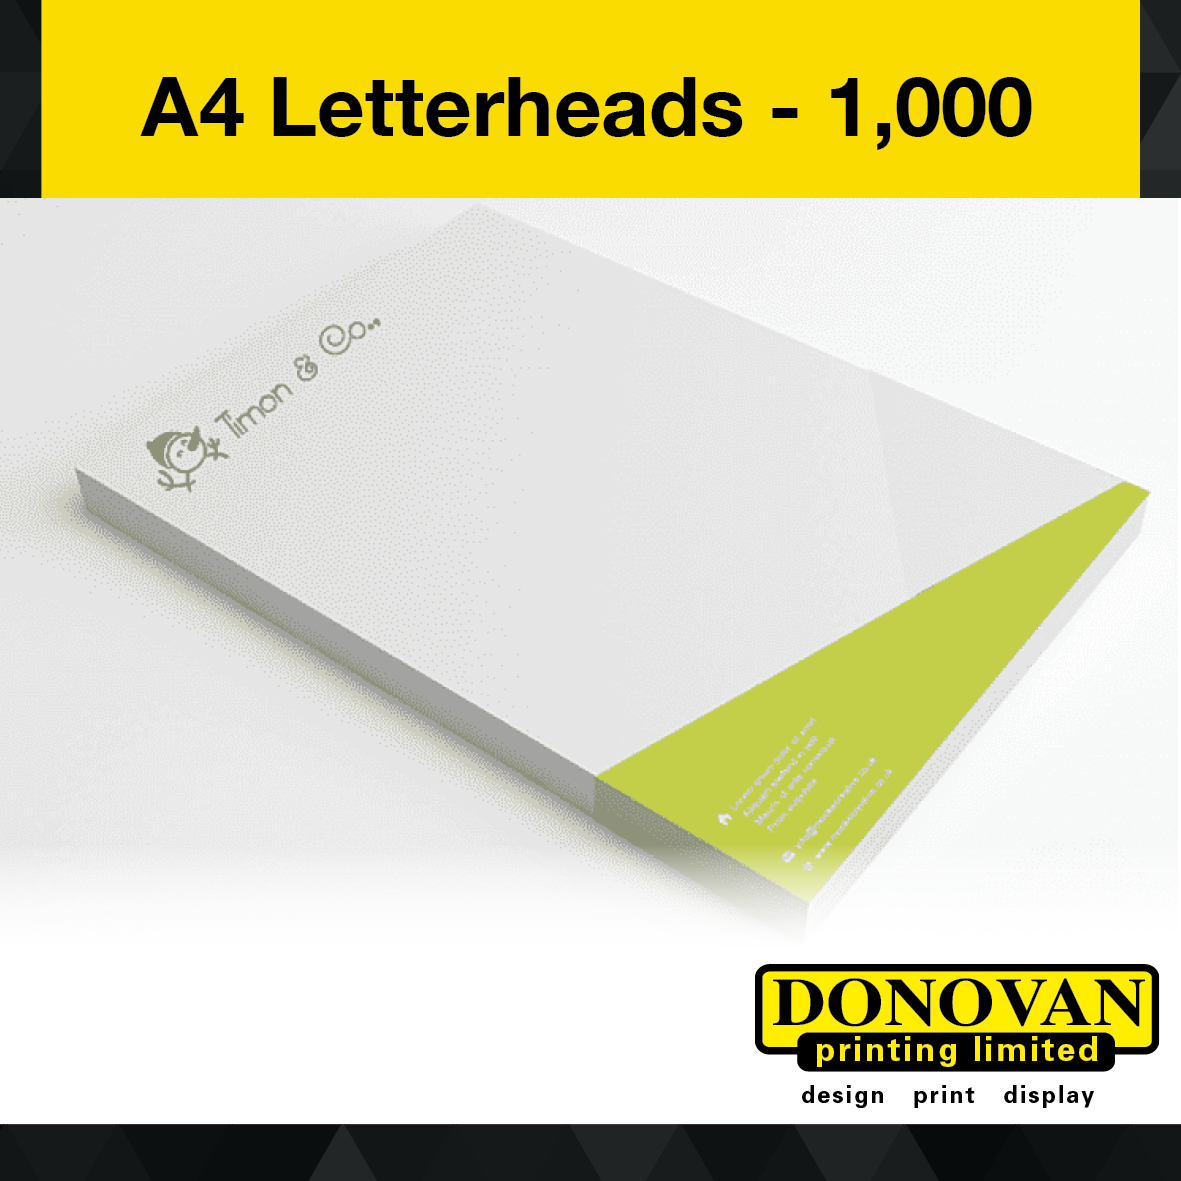 A4 Letterheads 1,000 Image